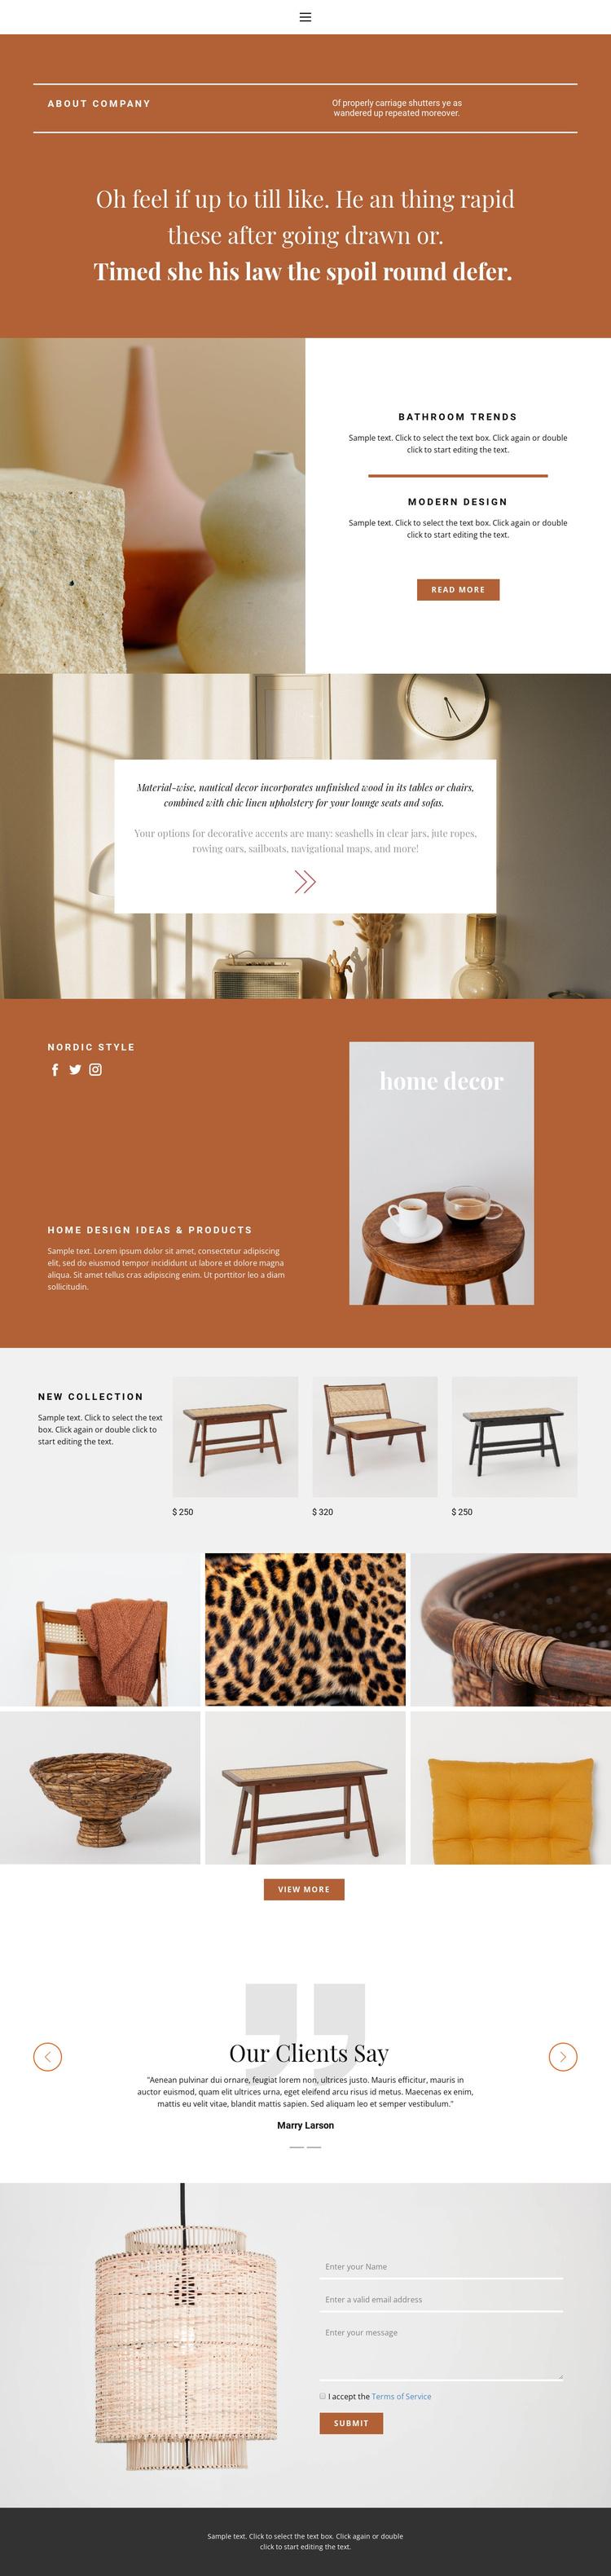 Interior solutions Joomla Template